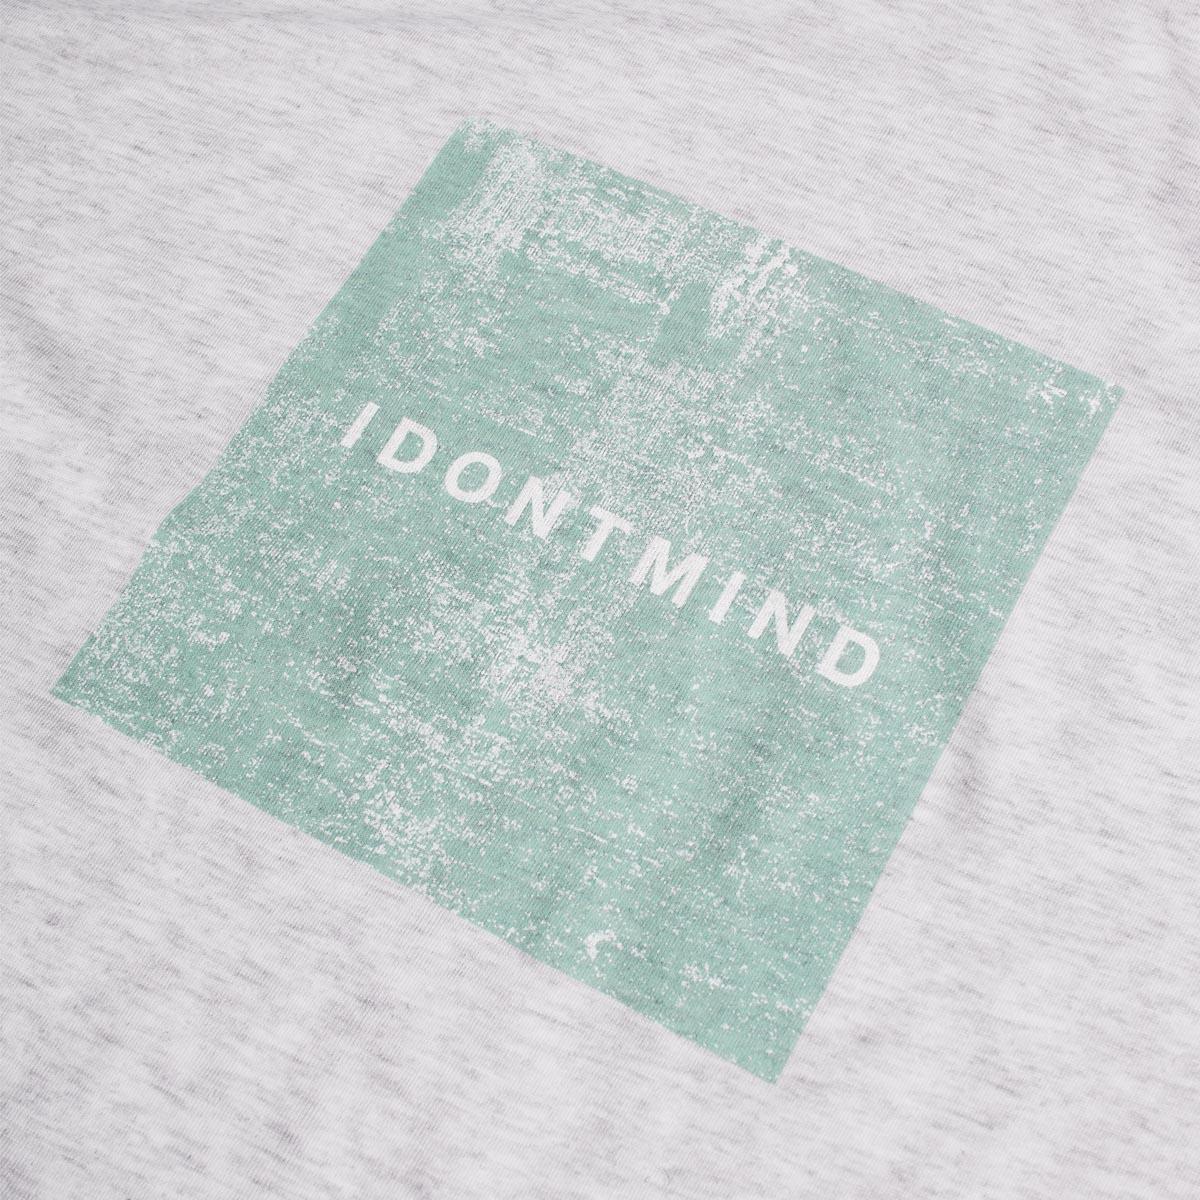 IDONTMIND-Vintage-Square-Tee-White-Detail.jpg